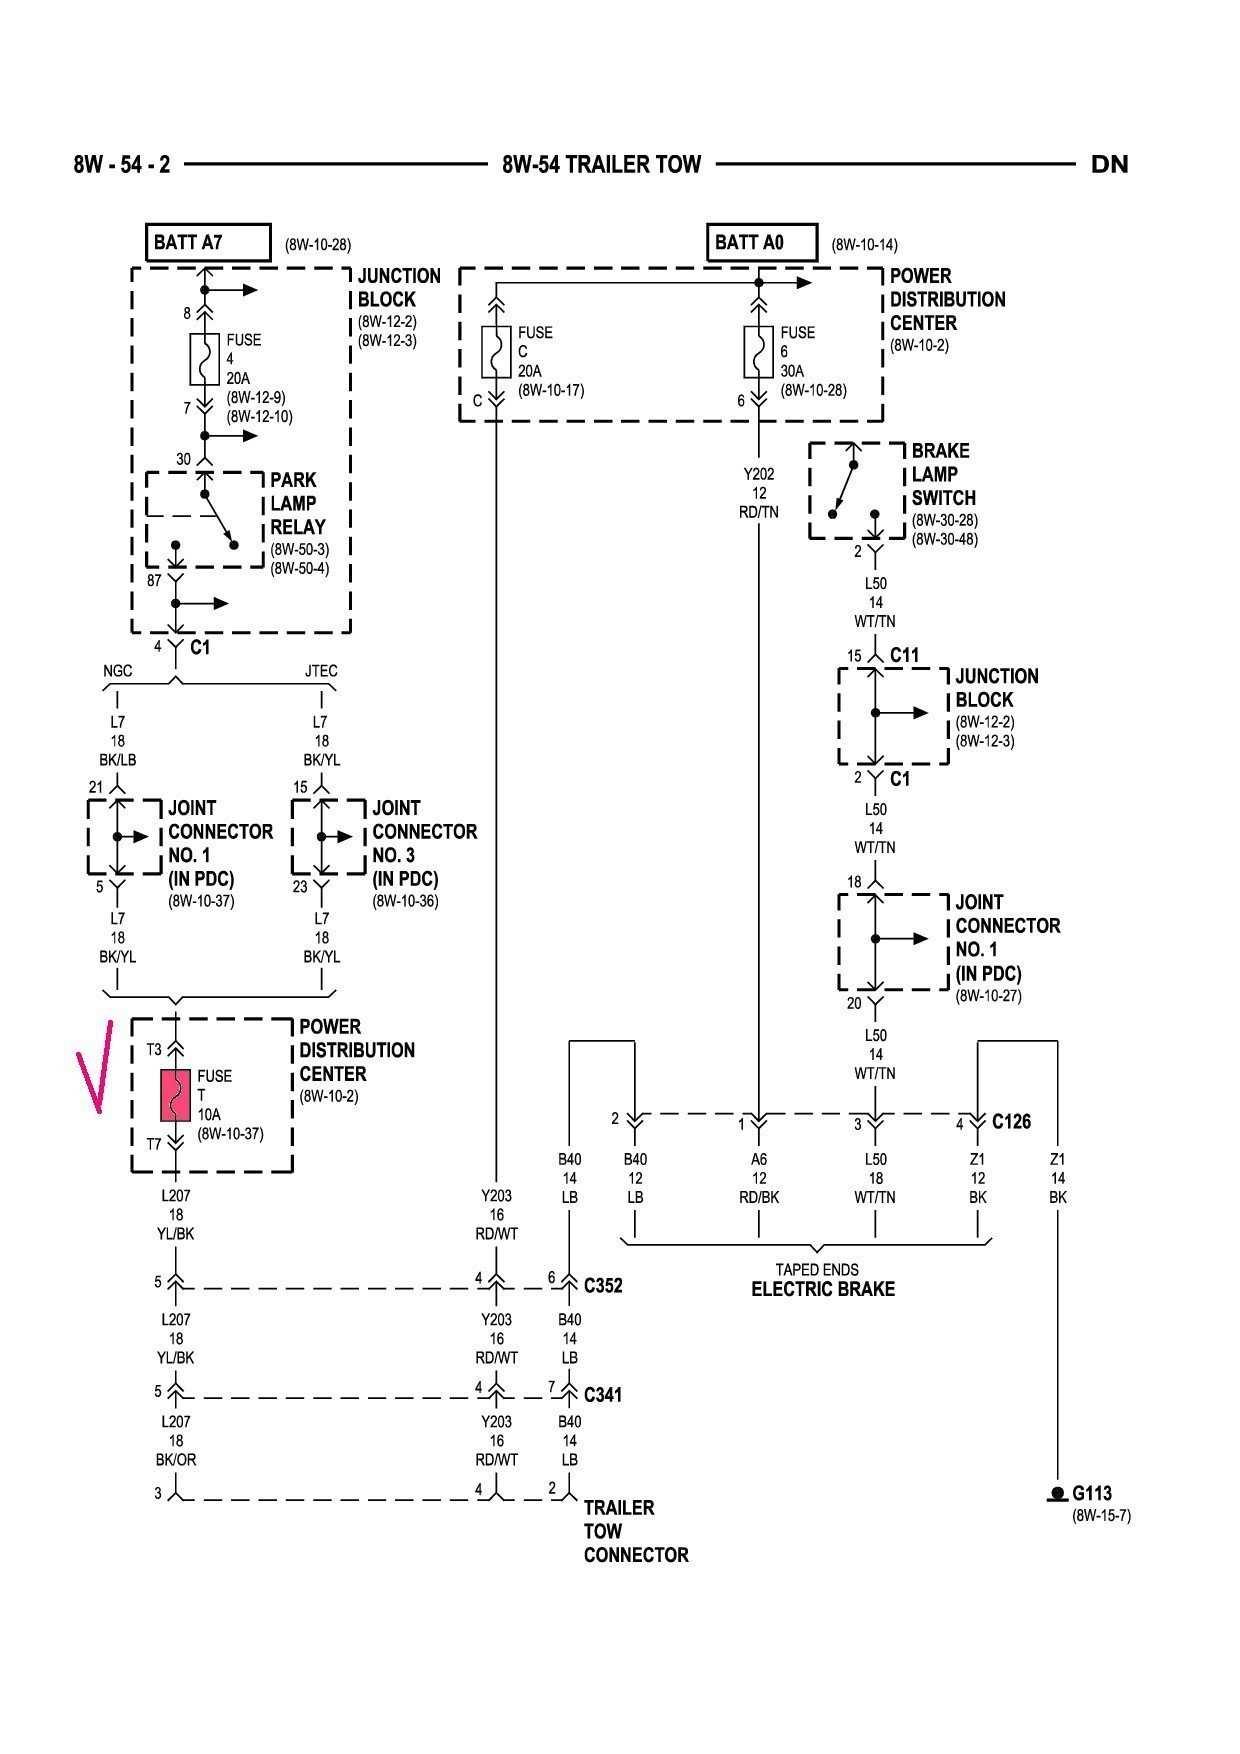 2006 Dodge Dakota Trailer Wiring Diagram